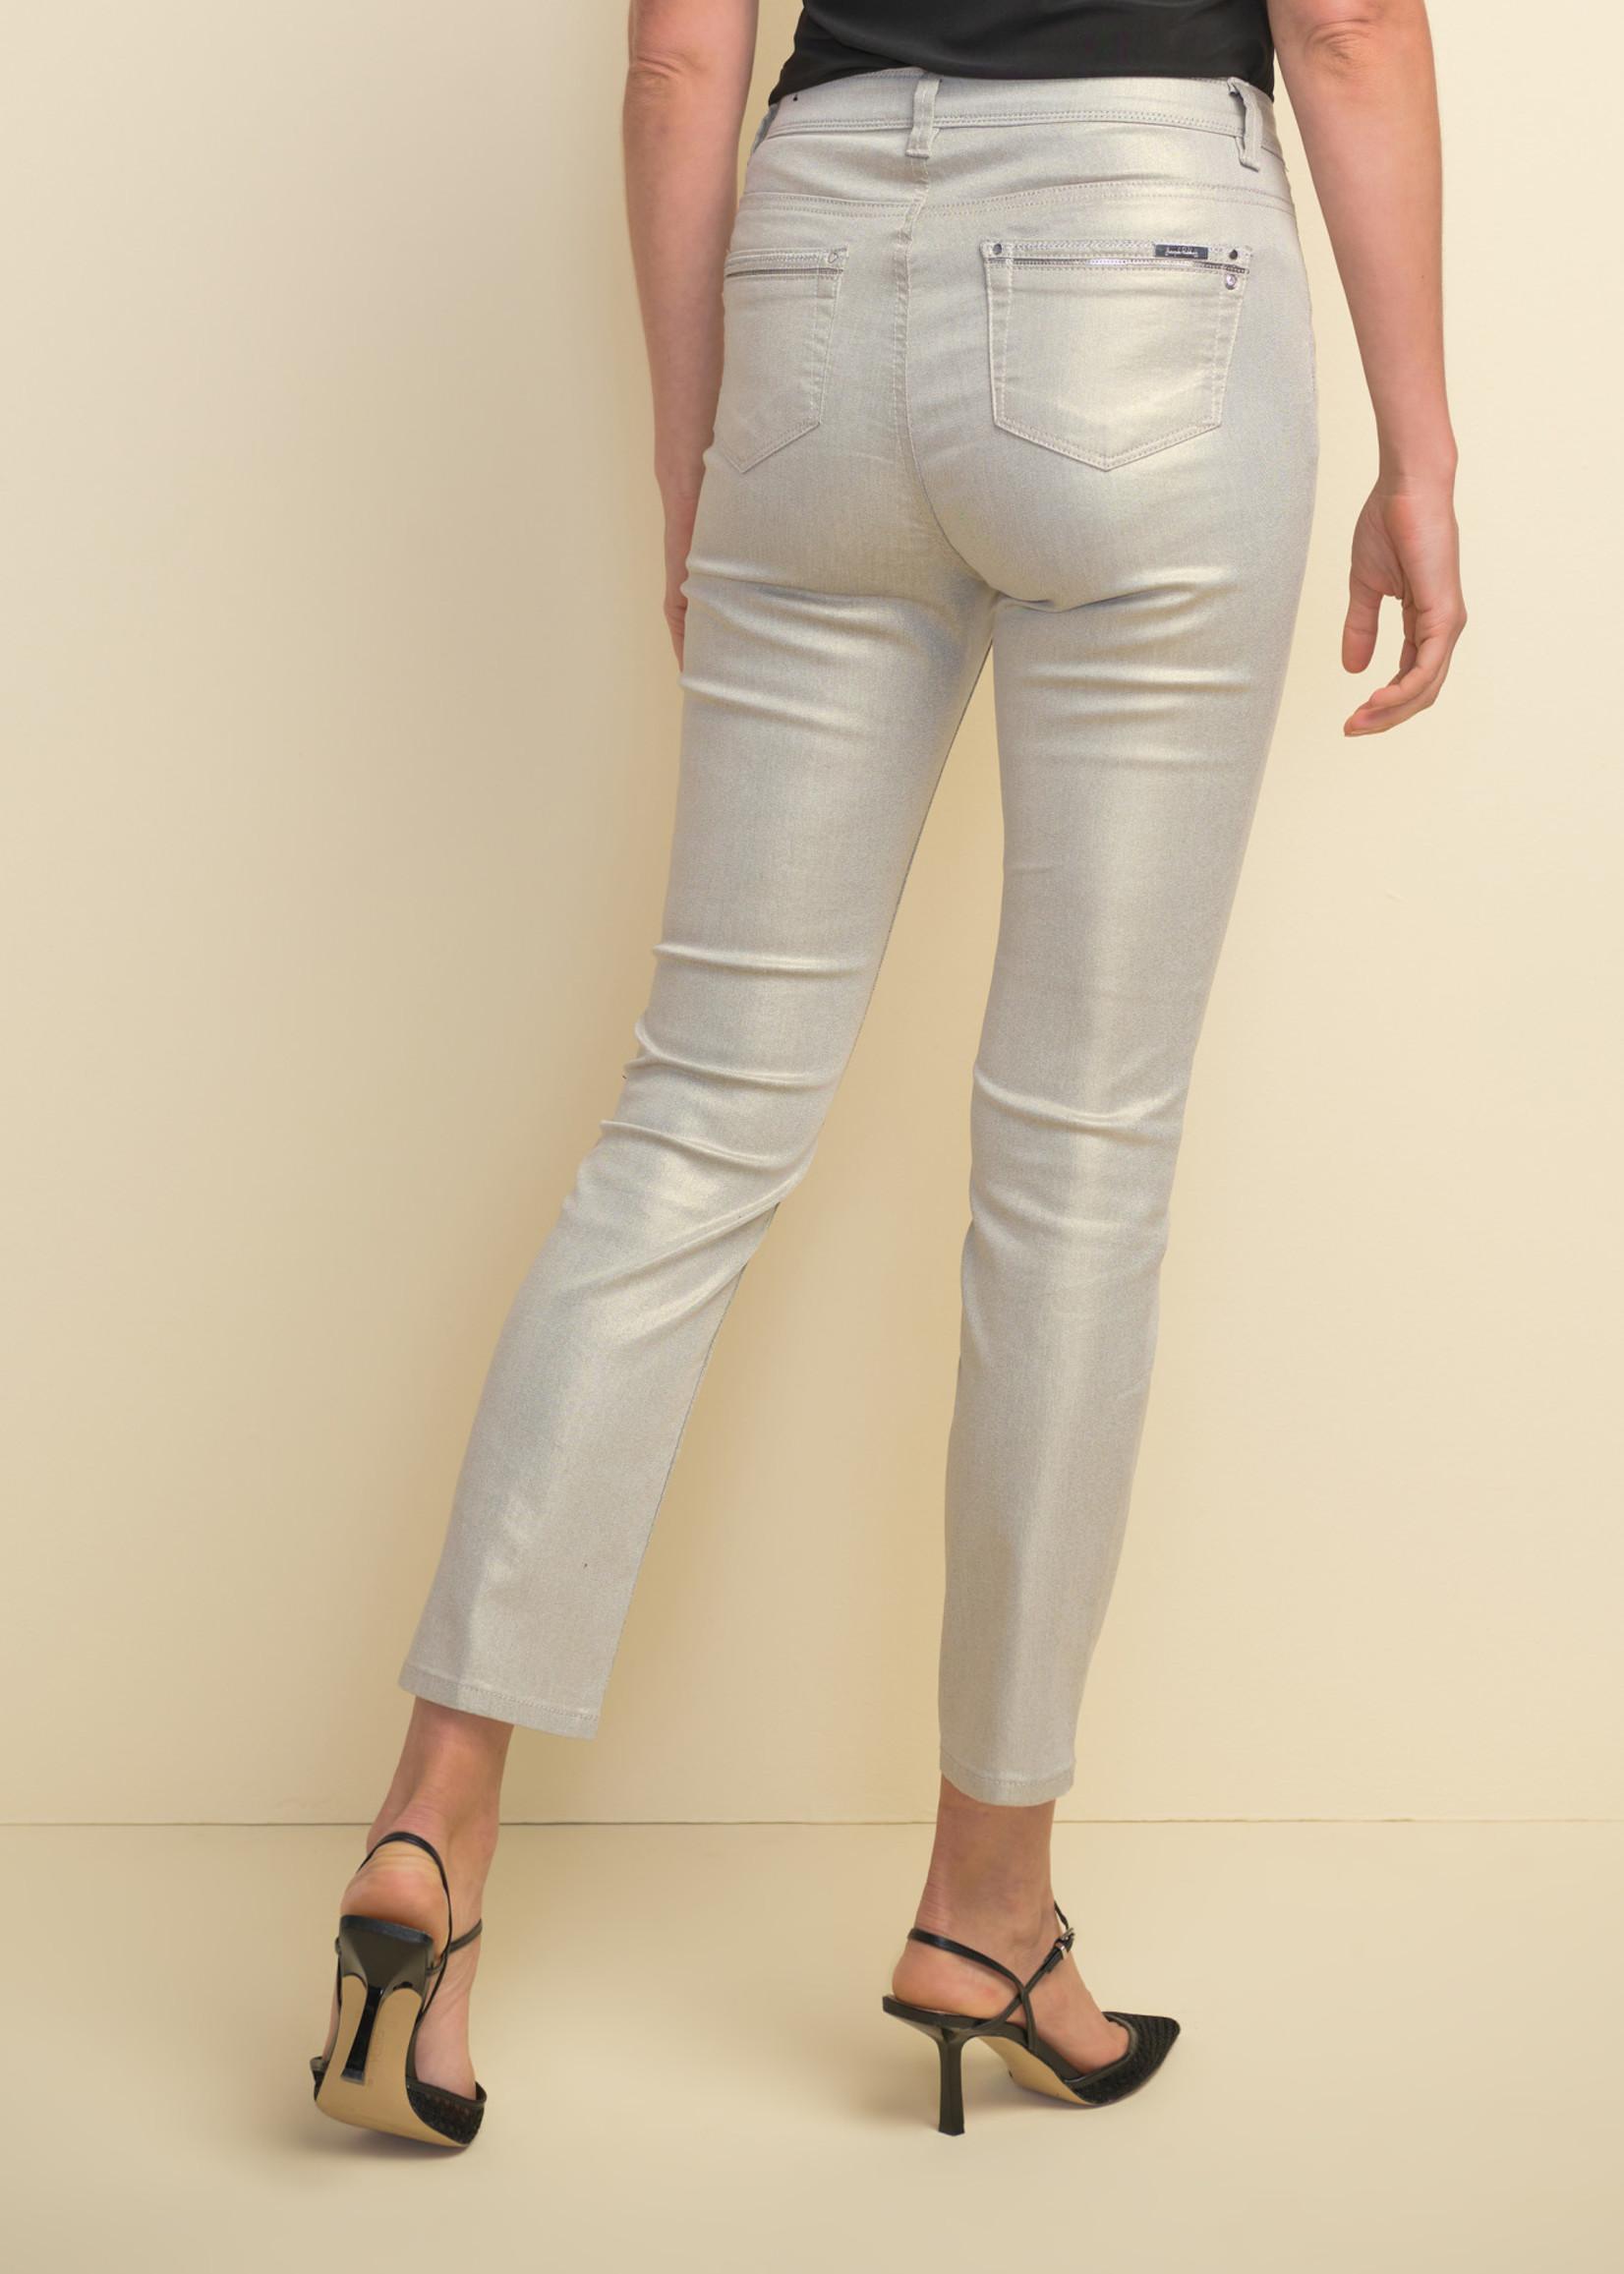 Joseph Ribkoff Joseph Ribkoff Shimmer Jeans